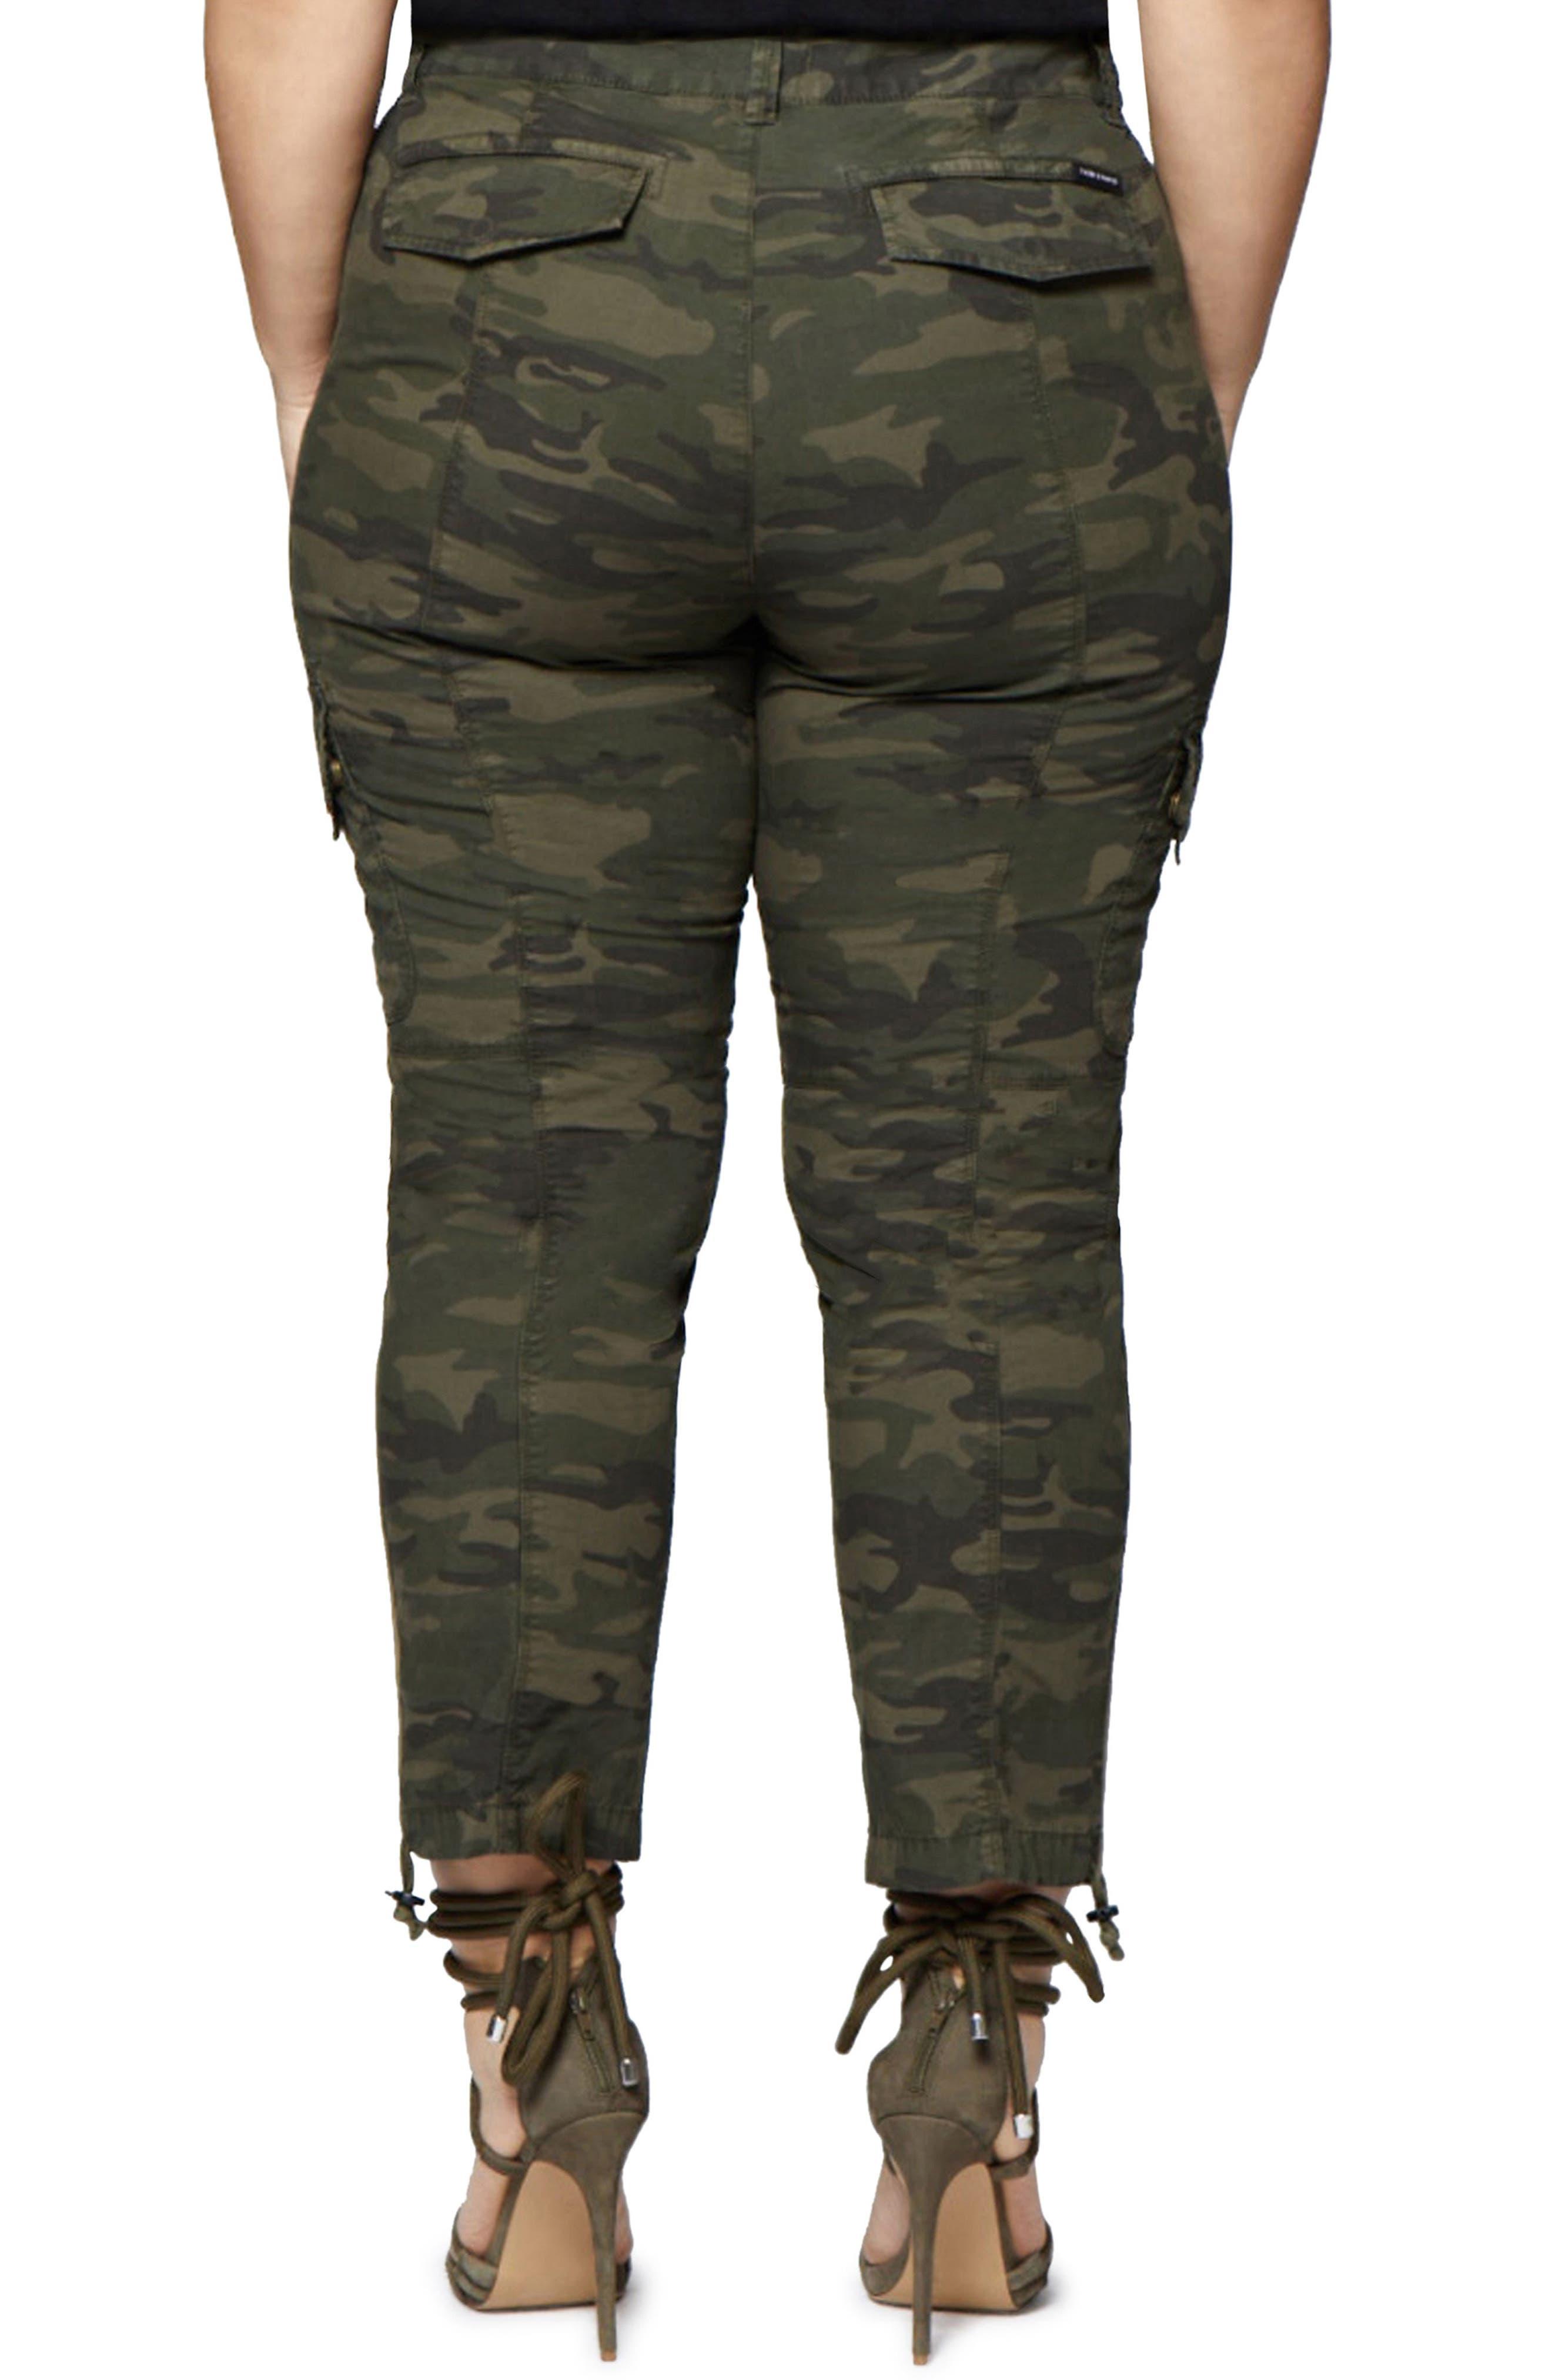 Terrain Camo Crop Cargo Pants,                             Alternate thumbnail 2, color,                             Mother Nature Camo